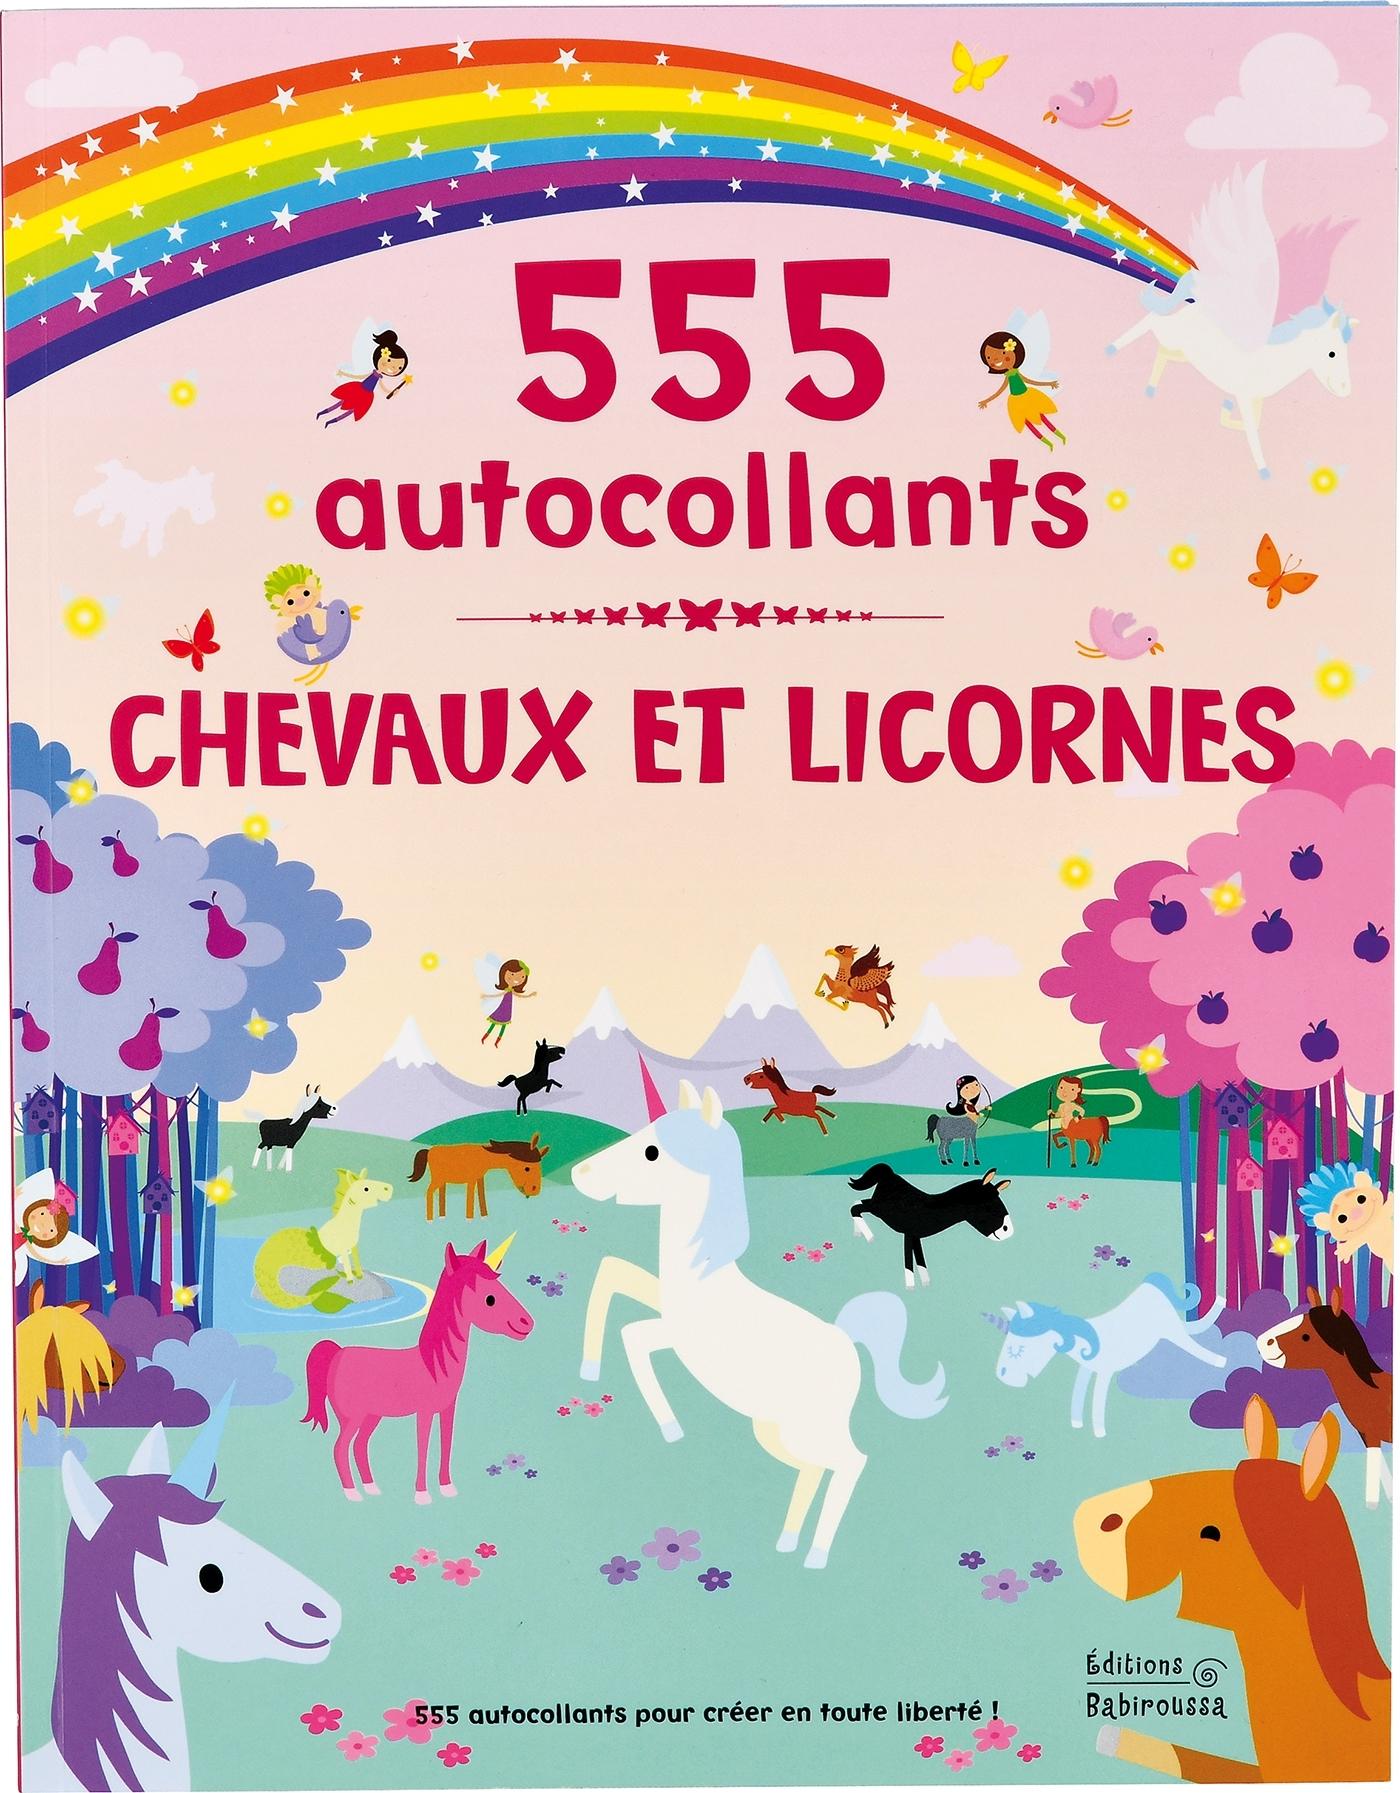 CHEVAUX ET LICORNES - 555 AUTOCOLLANTS